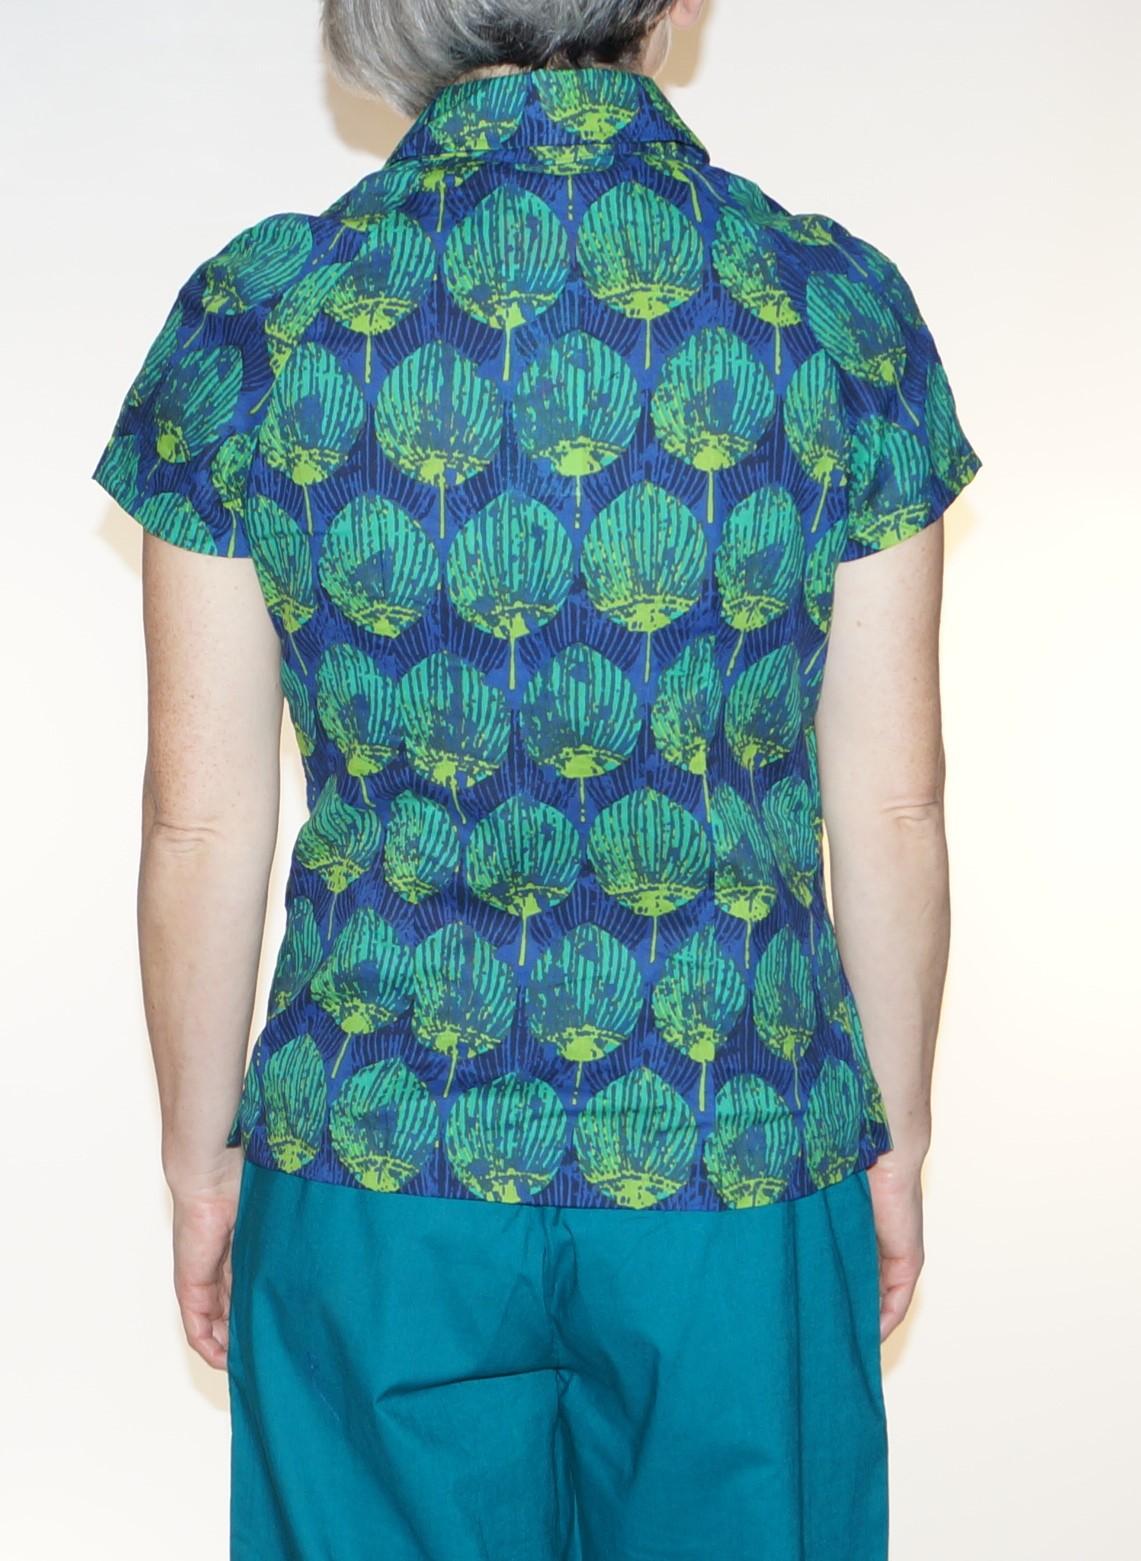 Chemise femme bleu et verte Kali Yog Boni